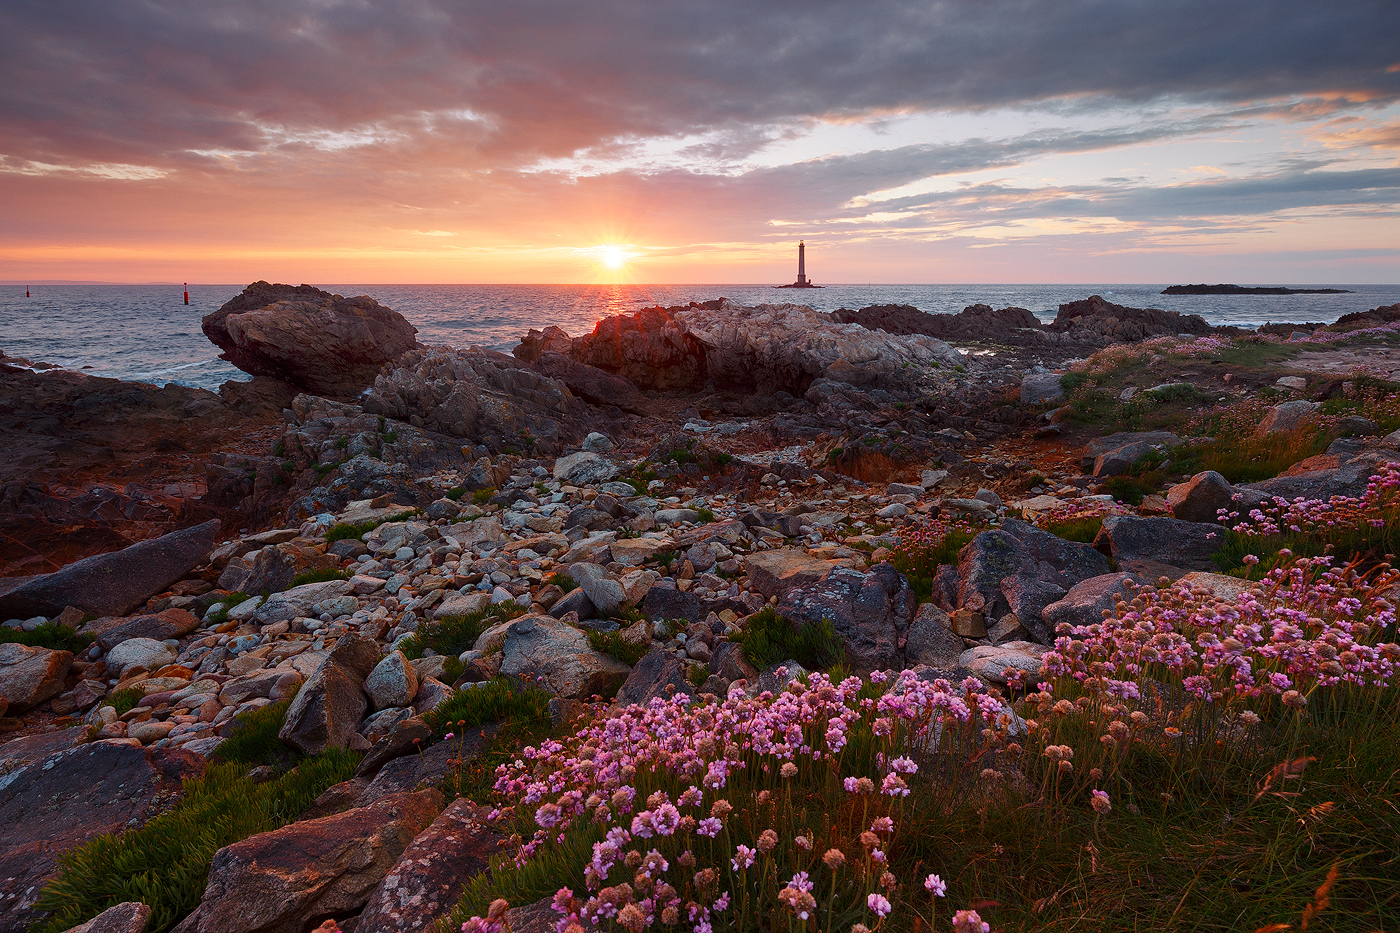 hague cotentin normandie - nicolas rottiers photographe normandie